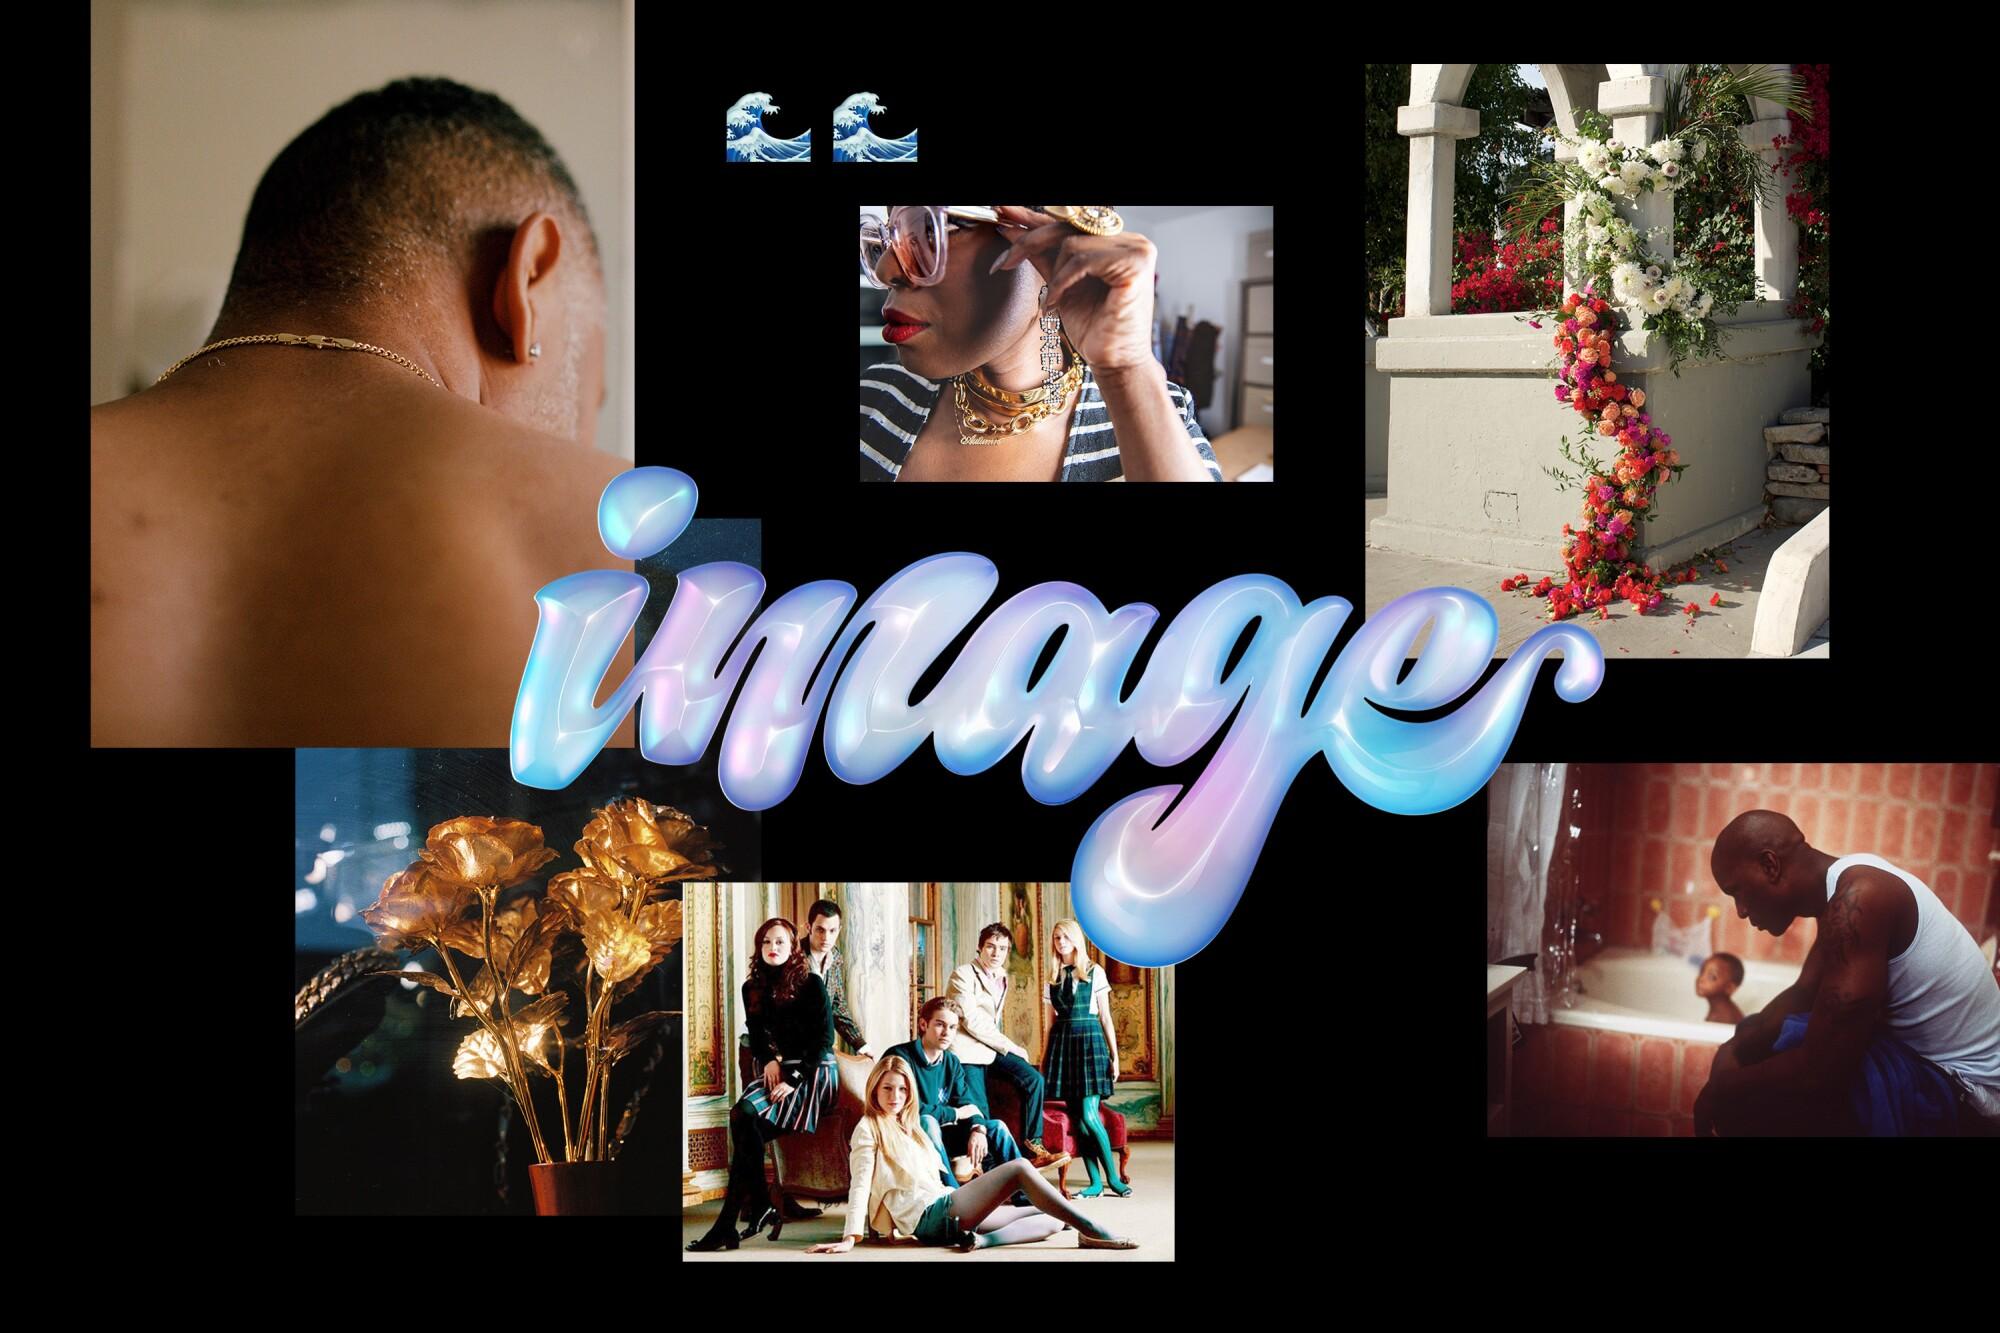 Image Magazine, Issue 01, Editor's Note.